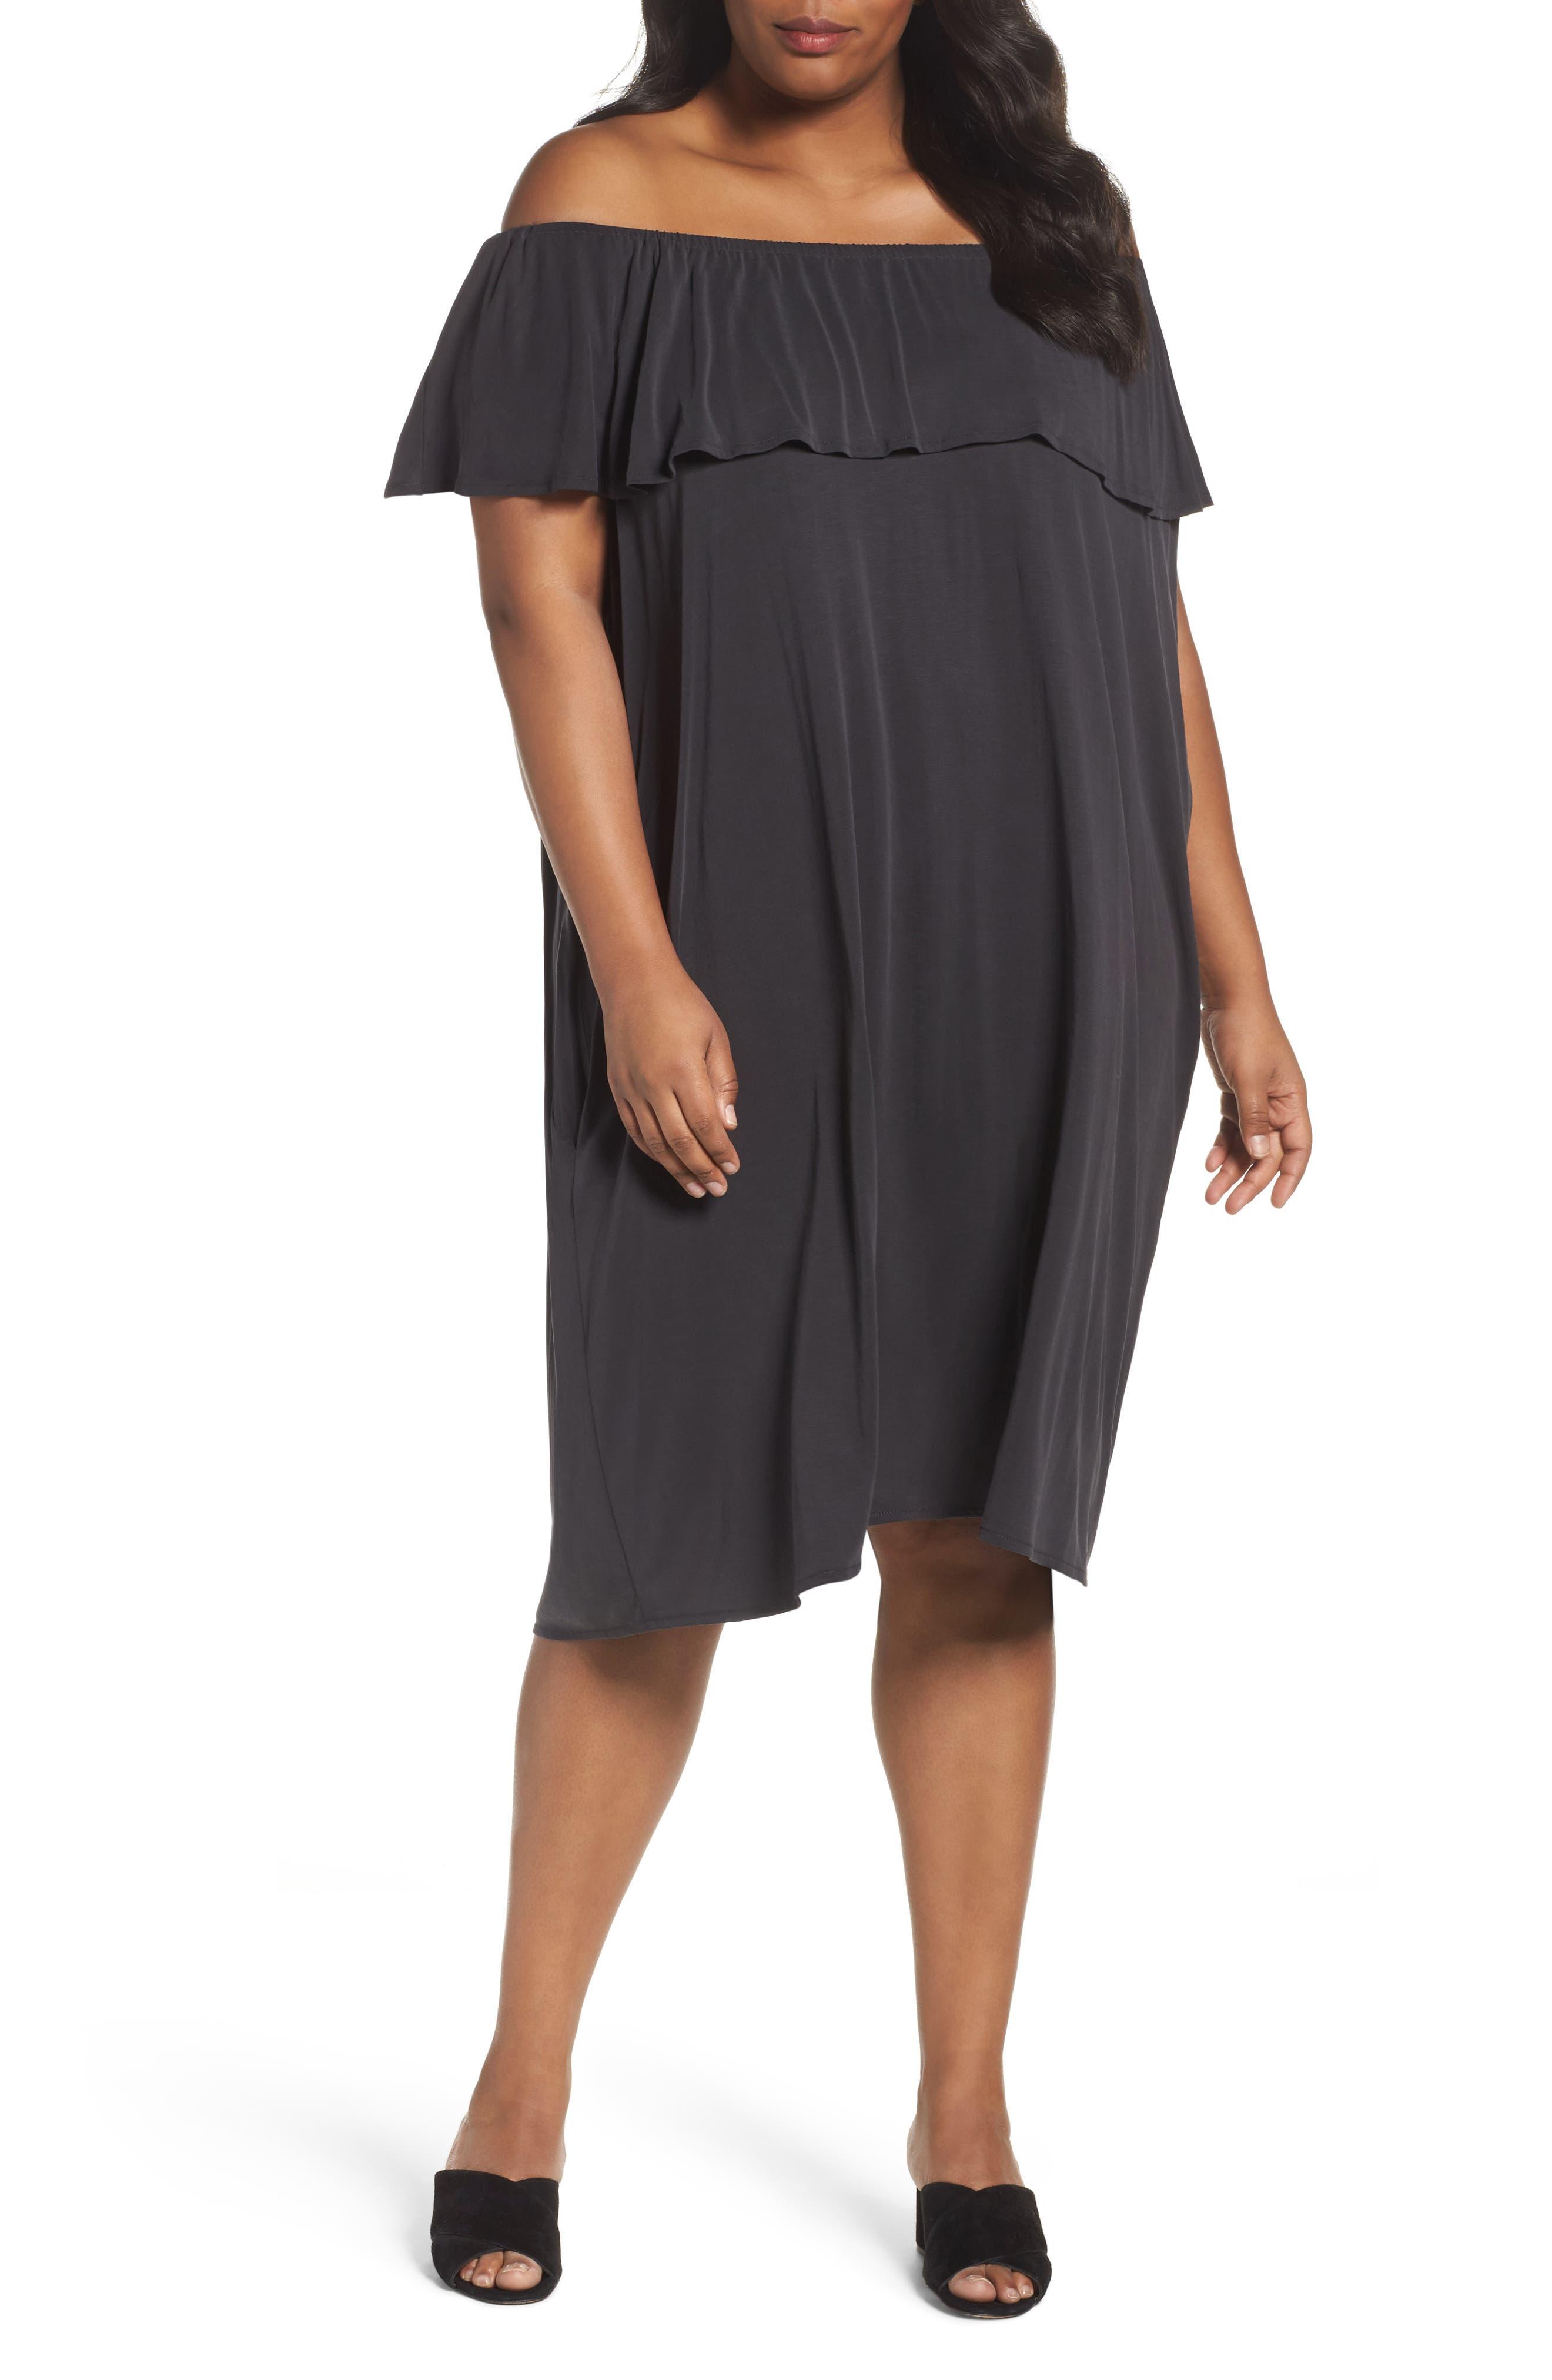 Main Image - NIC+ZOE Boardwalk Convertible Jersey Dress (Plus Size)